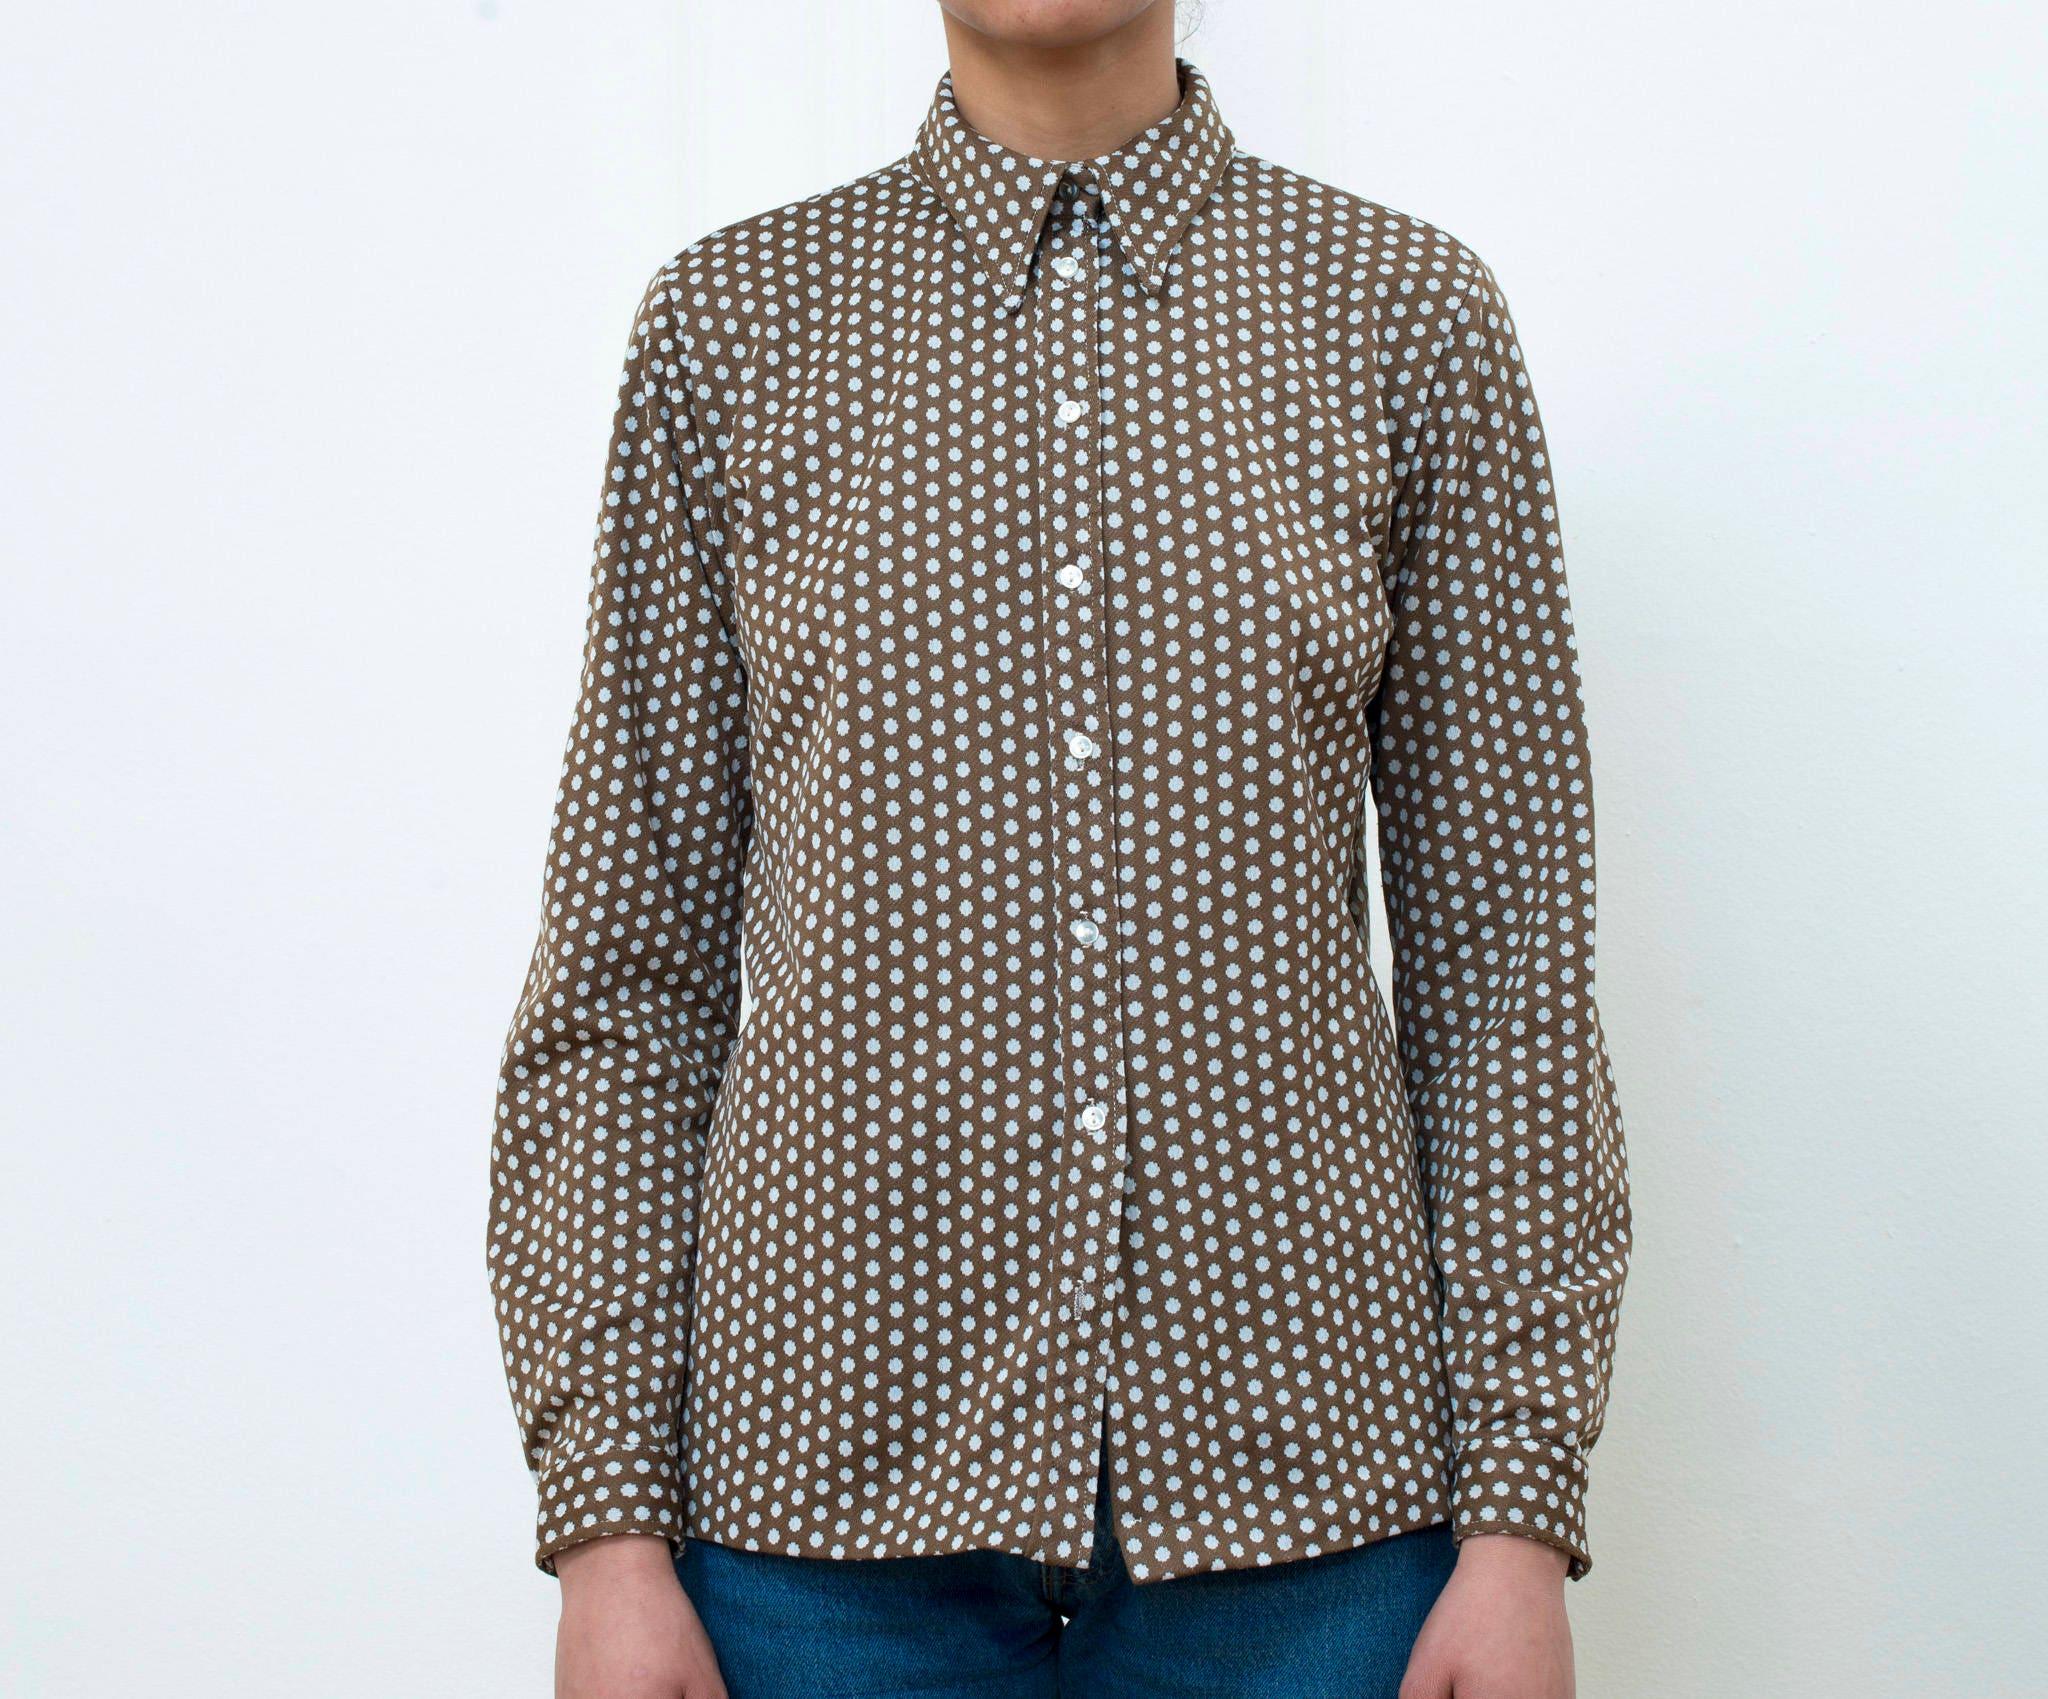 8602015883fc 70s brown printed blouse polka dot button down shirt